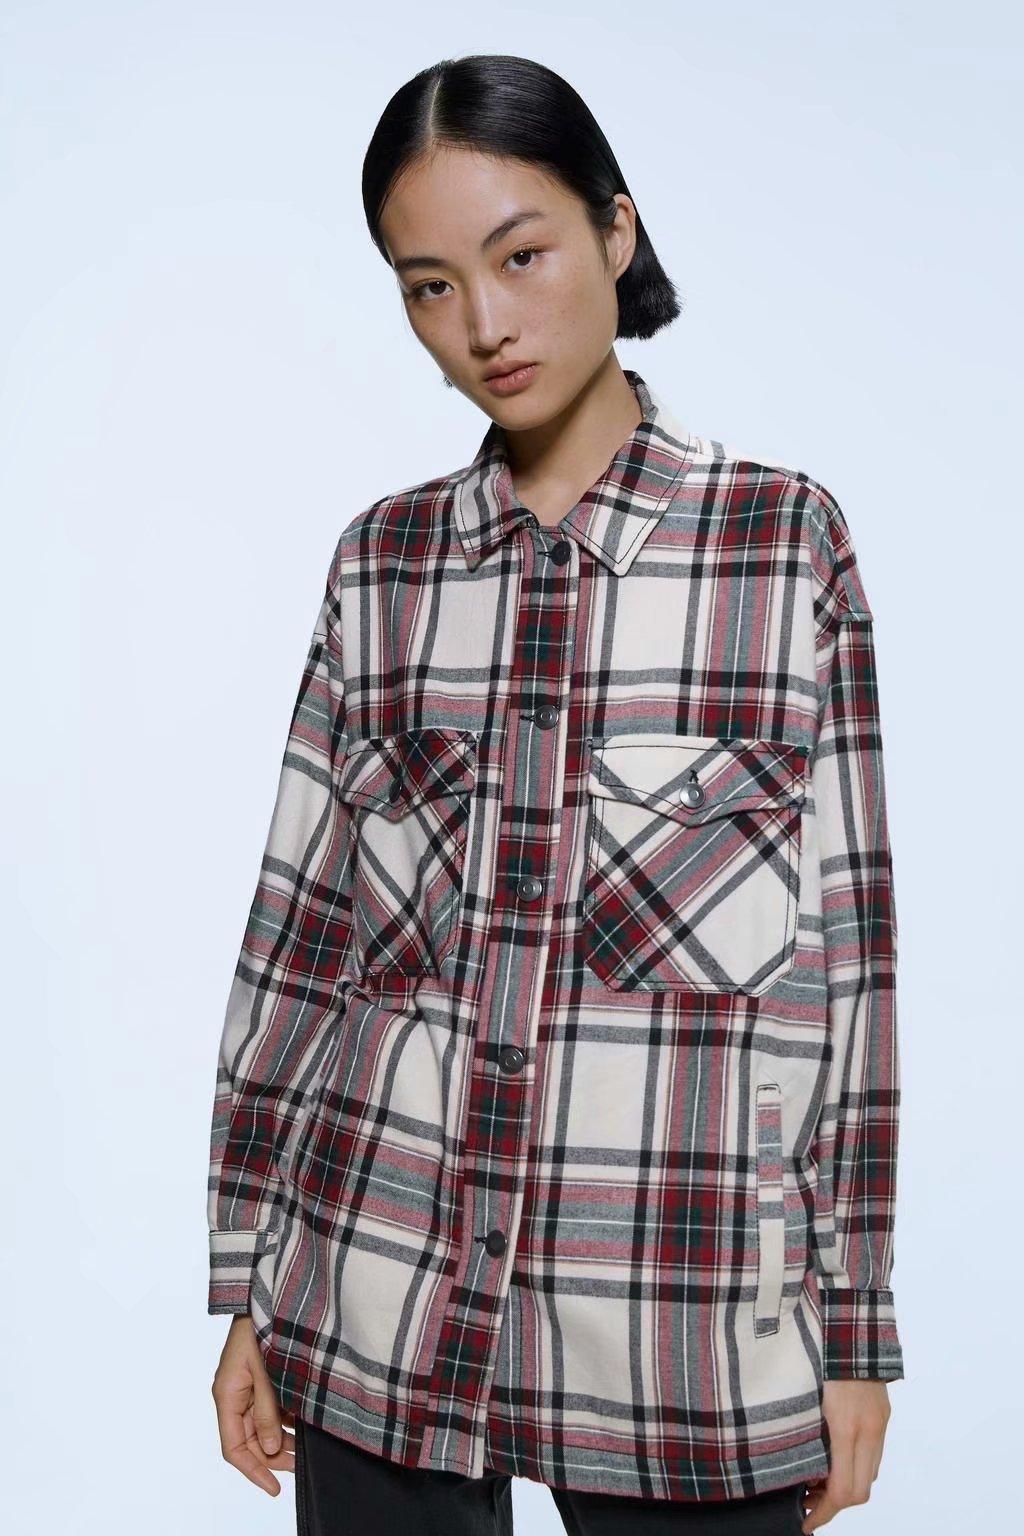 2020 Spring Autumn New Plus Size Zaraing Women Plaid Shirt Jacket Sheining Vadiming Female Plaid Shirt Plus Size A9568